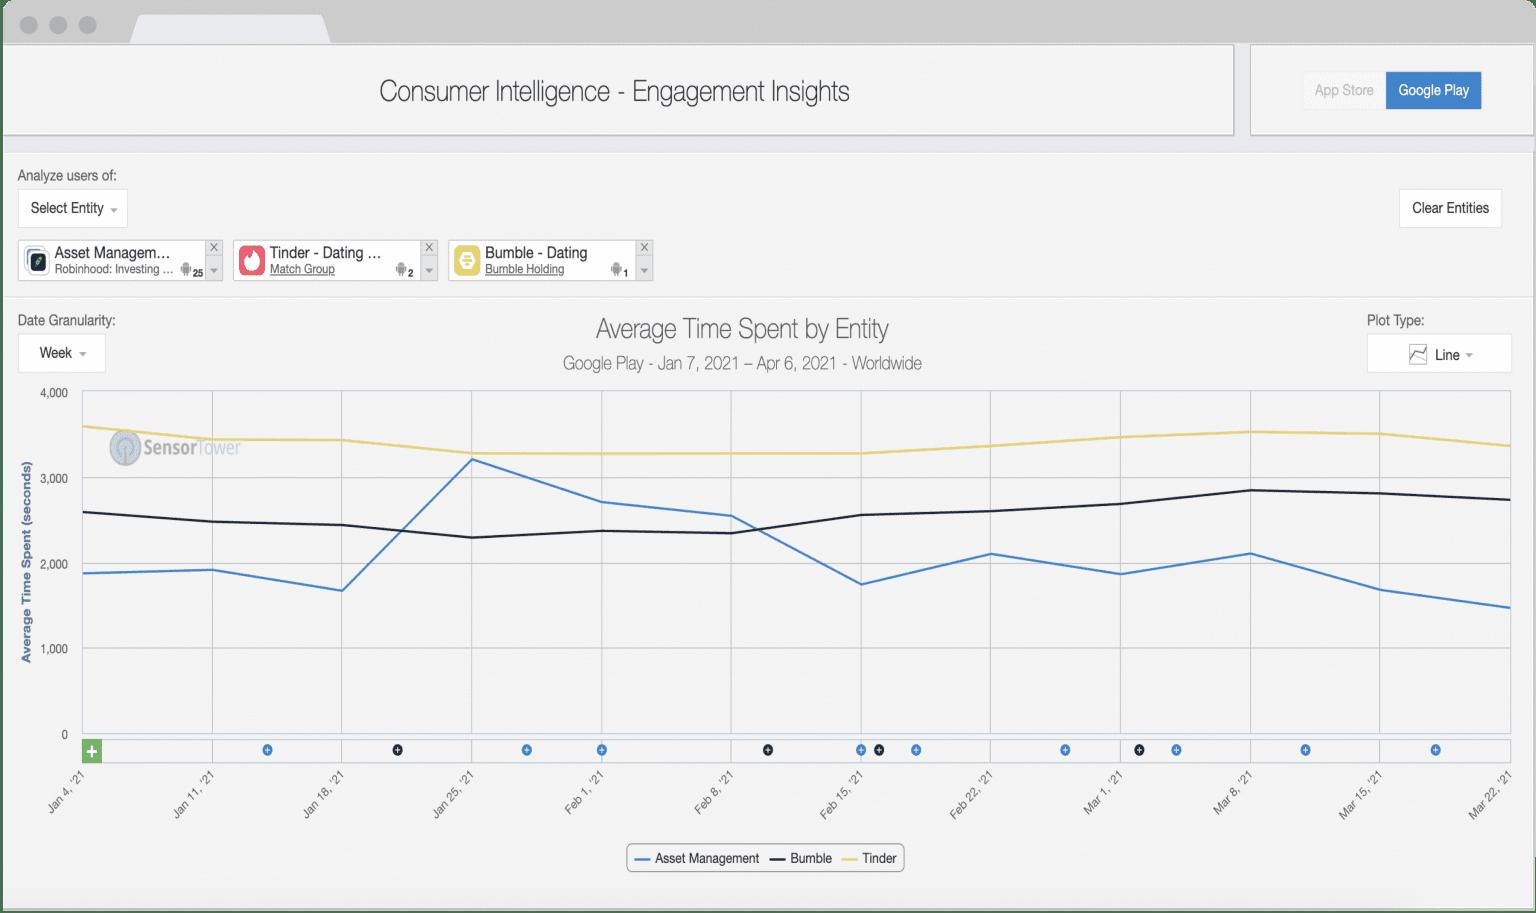 sensortower consumer engagement insights graph